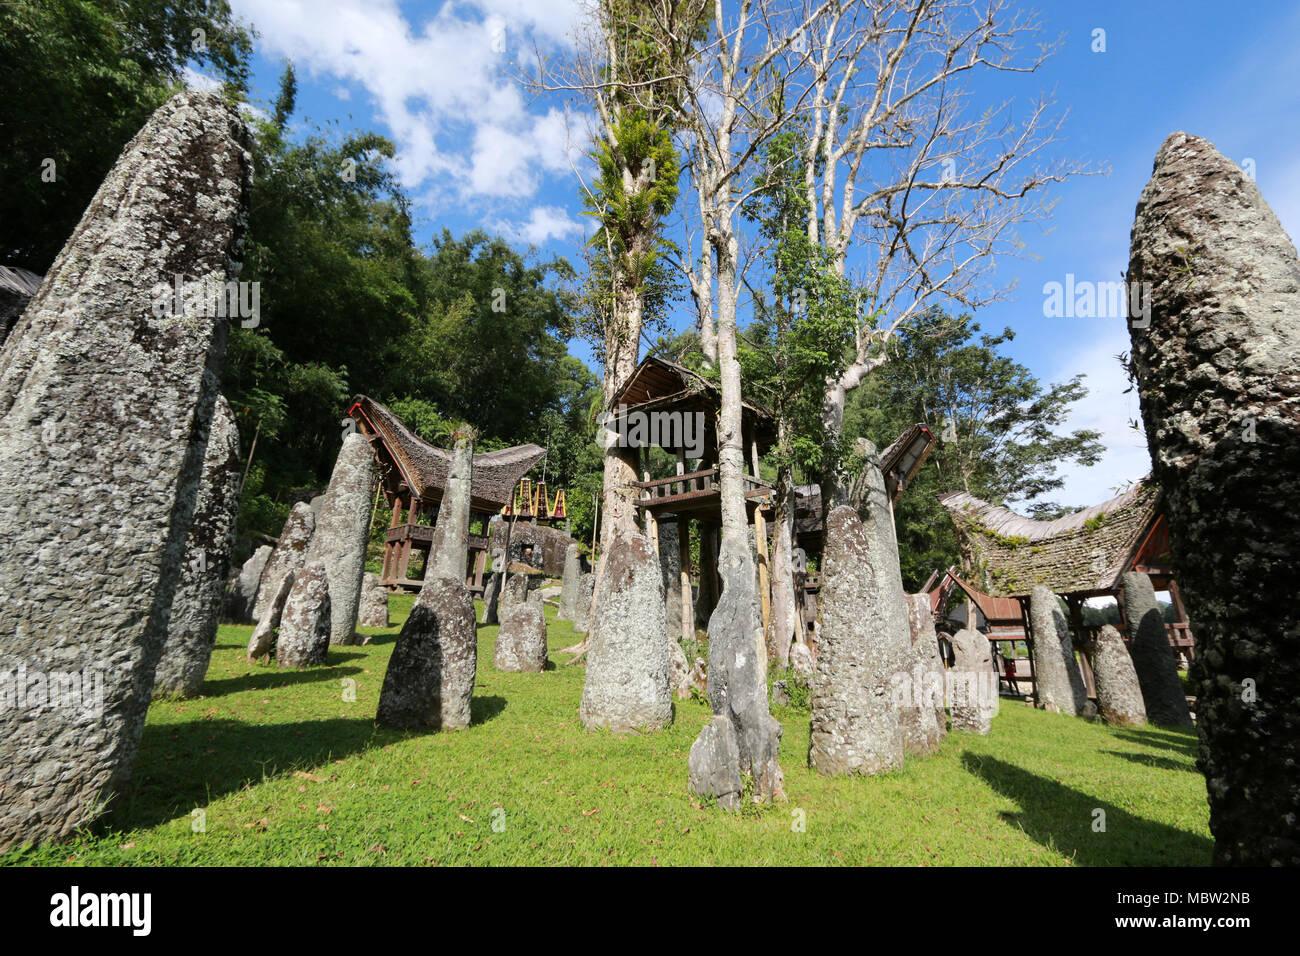 Upper Class Cemetery: Bori' Parinding Megalith Burial Site, Toraja, Sulawesi, Indonesia - Stock Image